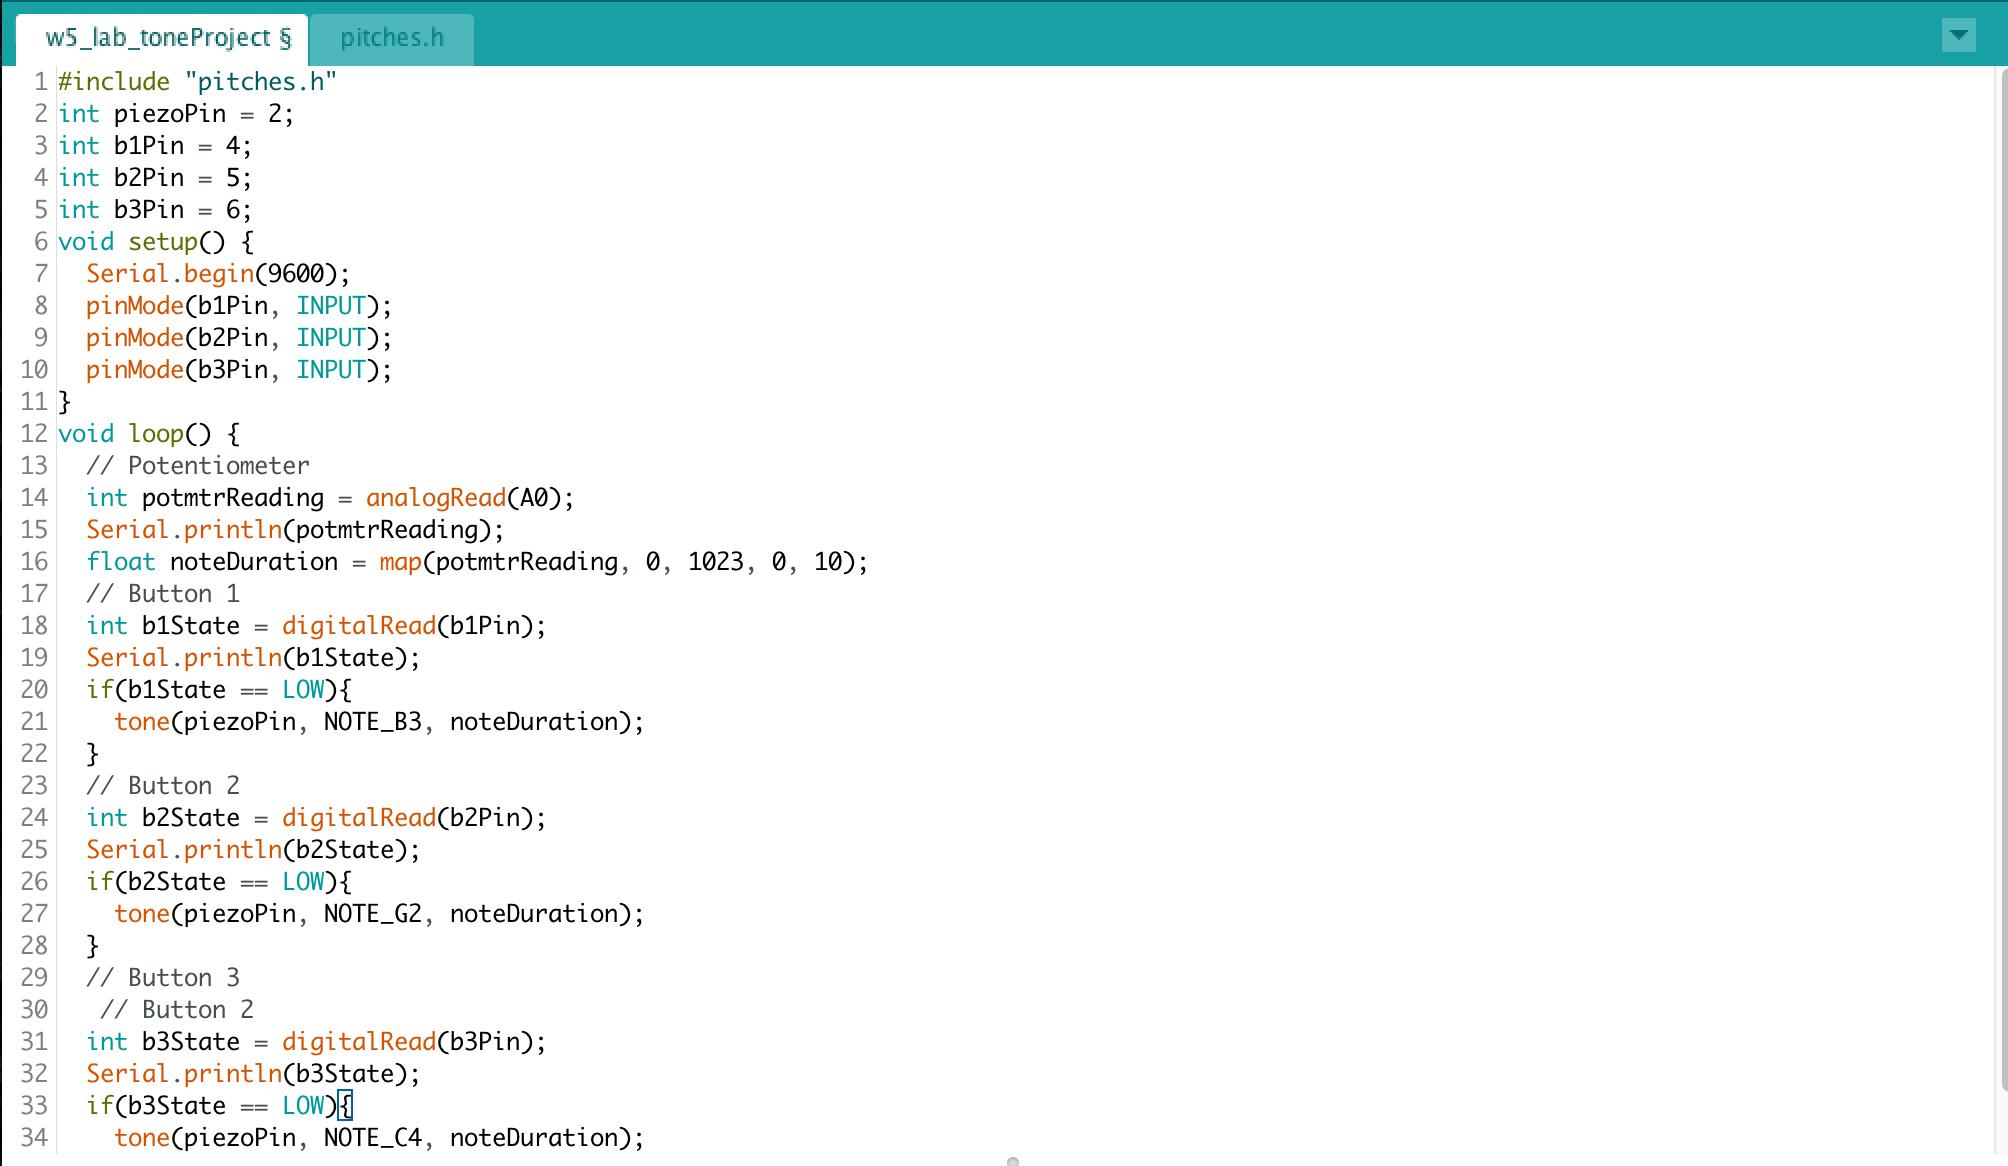 Figure 5 : Tone project code